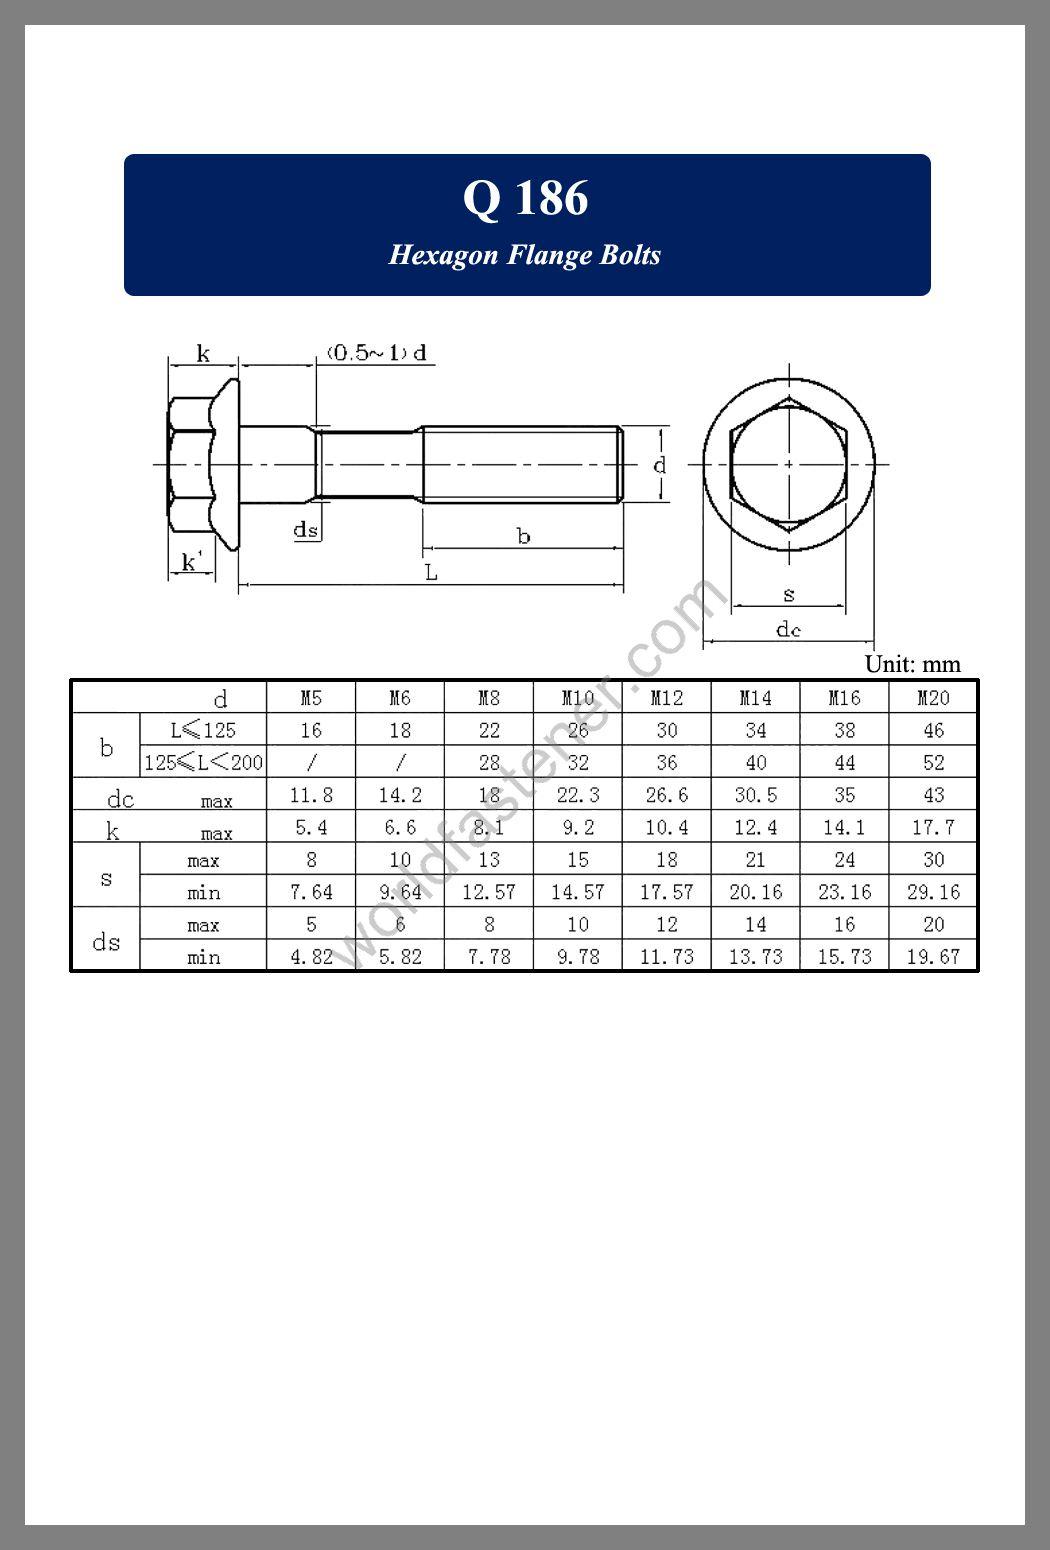 Q 186, Q 186 Flanged Bolts, Flange screws, fastener, screw, bolt, Q bolts